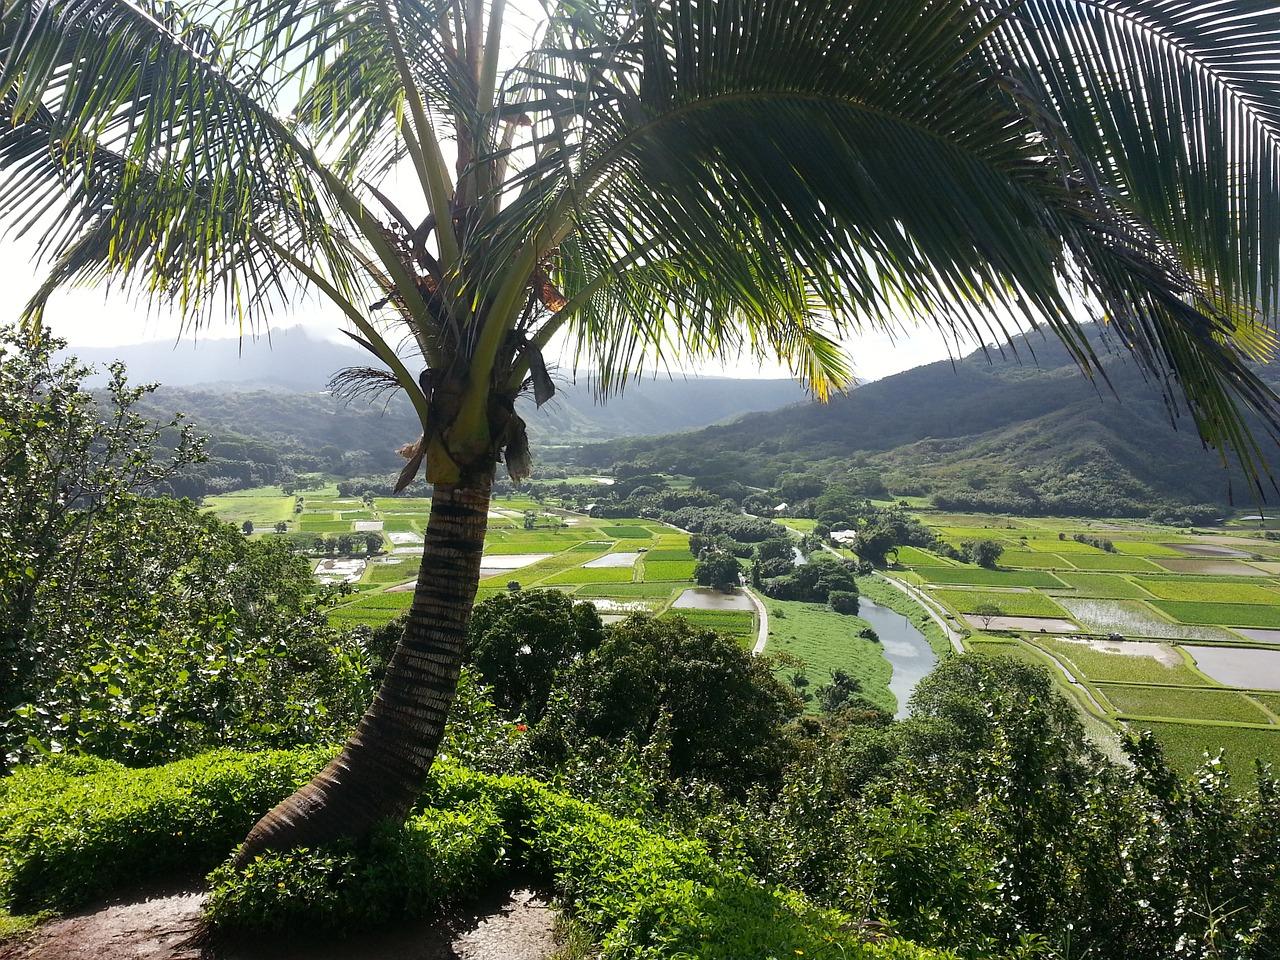 Hanalei, Kauai | Public Domain/Pixabay